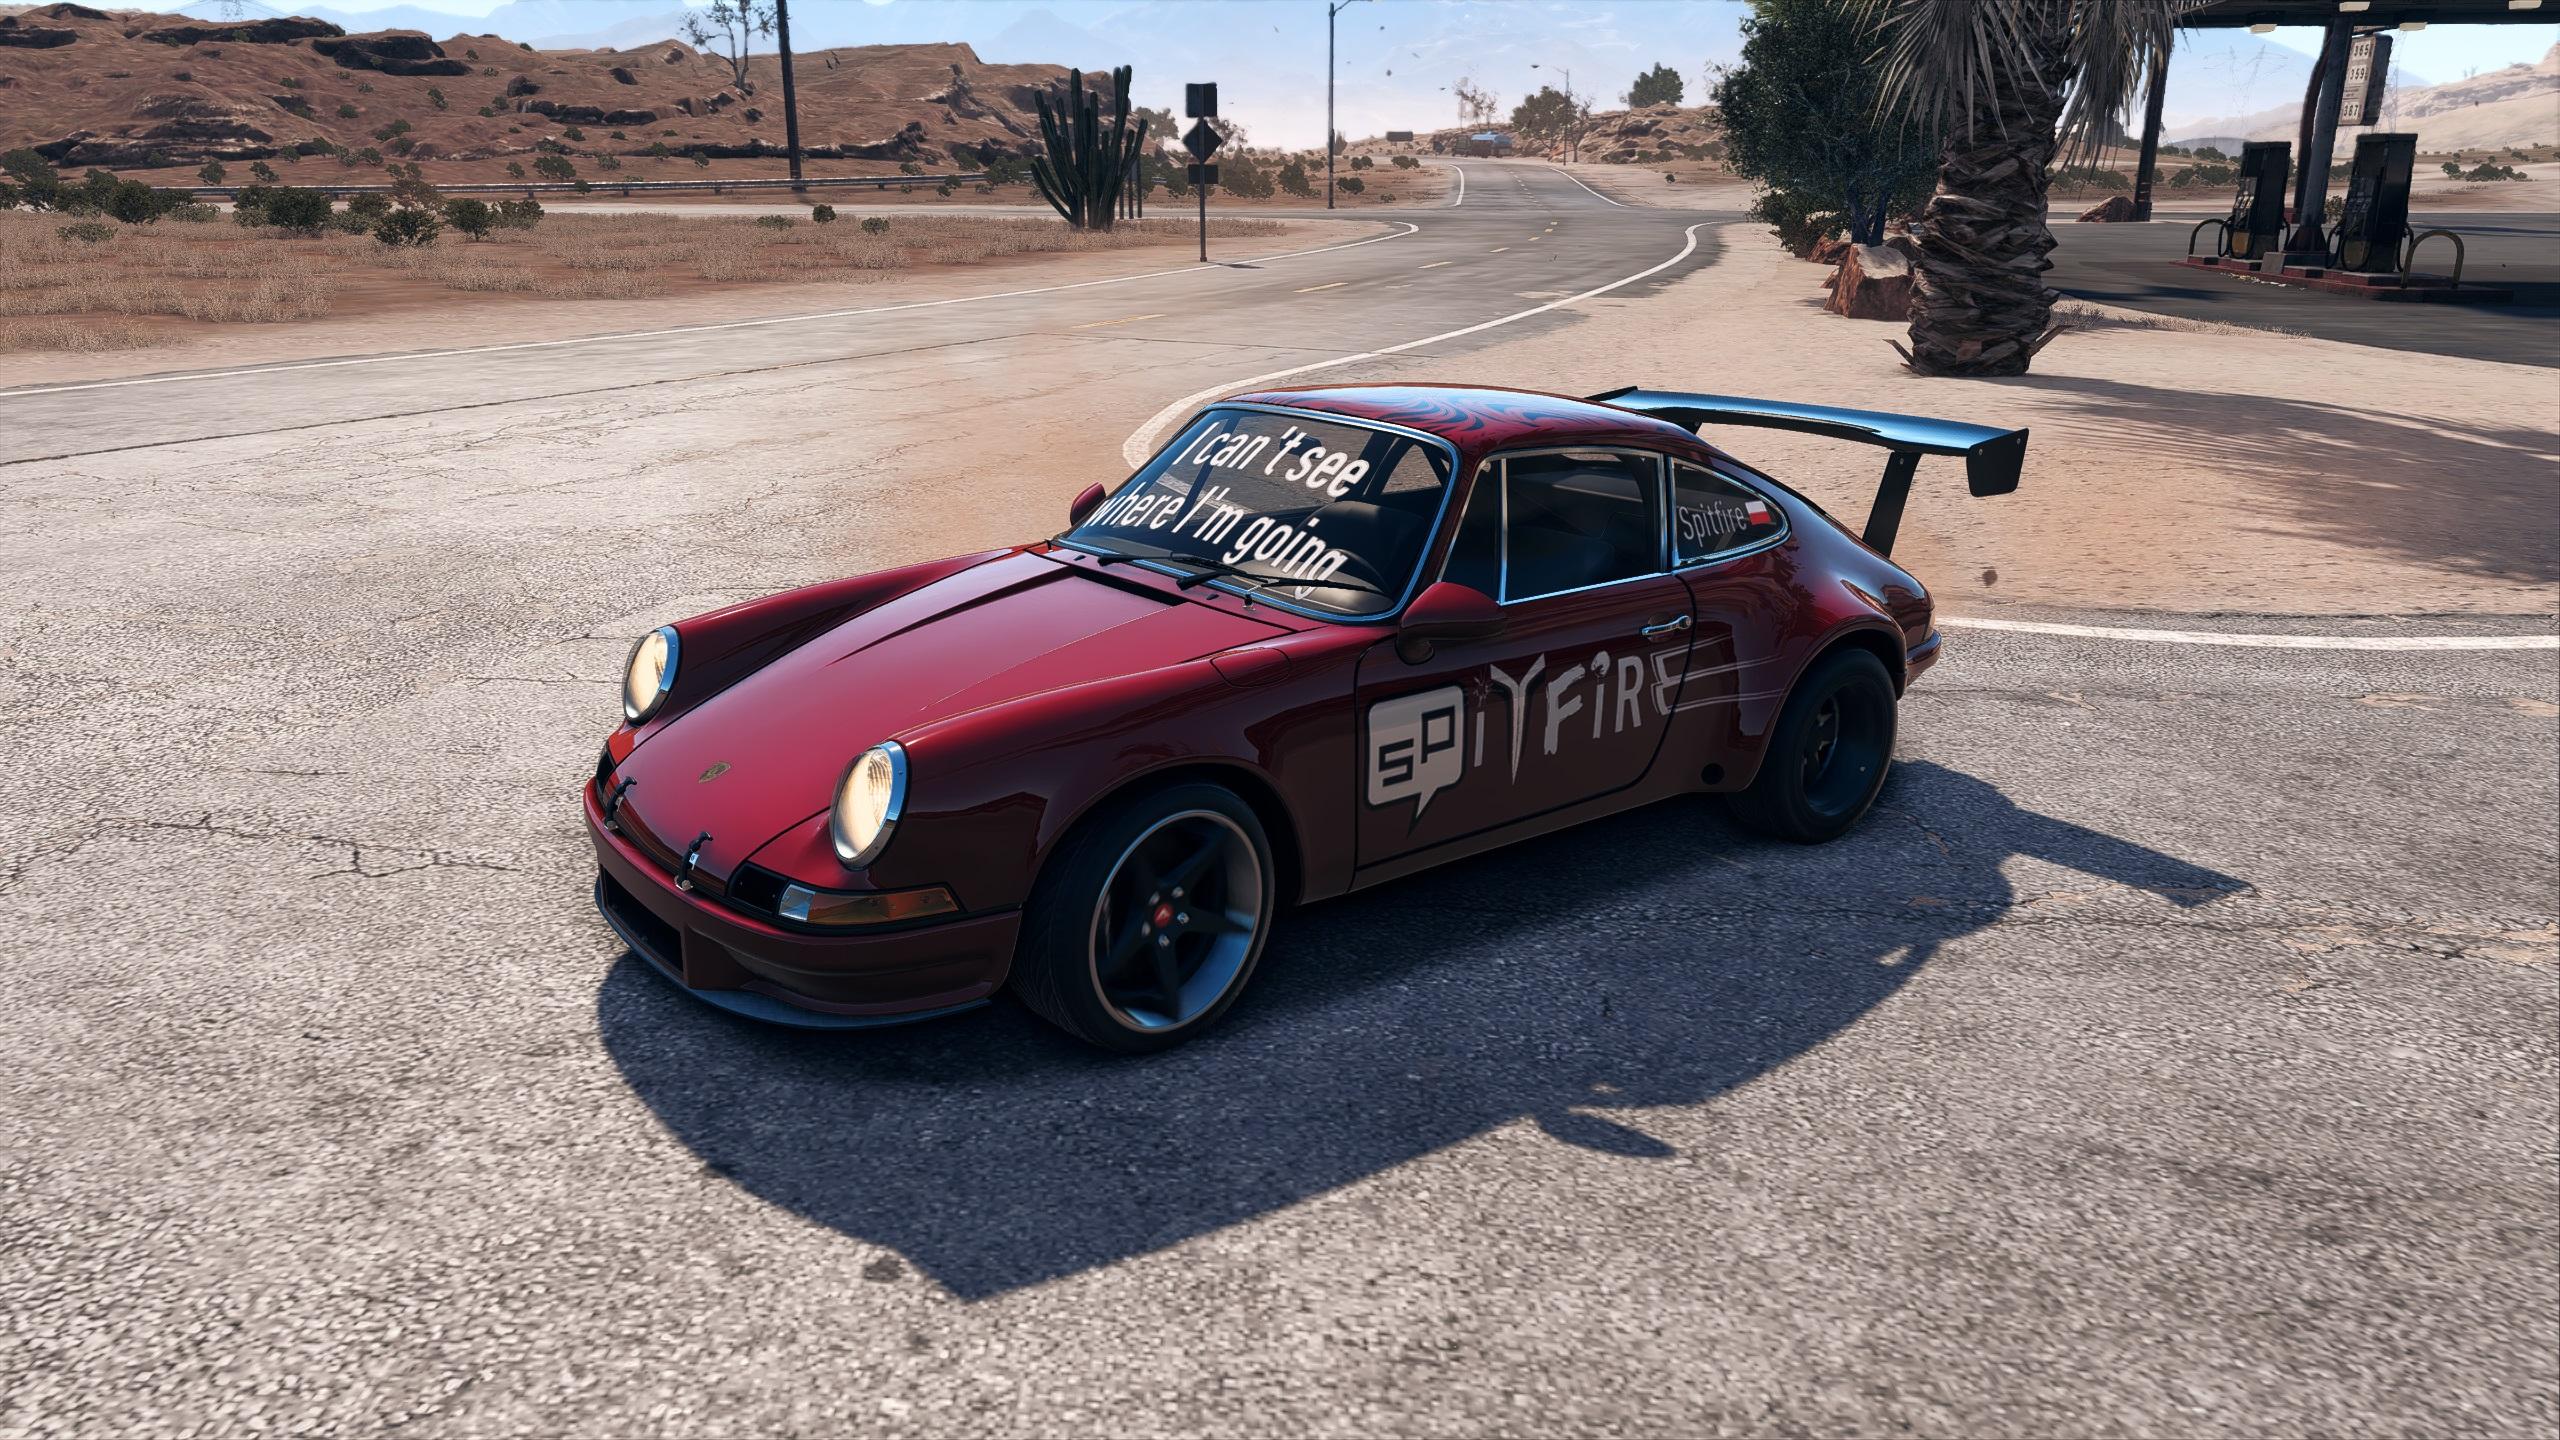 Need for Speed Payback Screenshot 2018.02.14 - 18.44.51.76.jpg